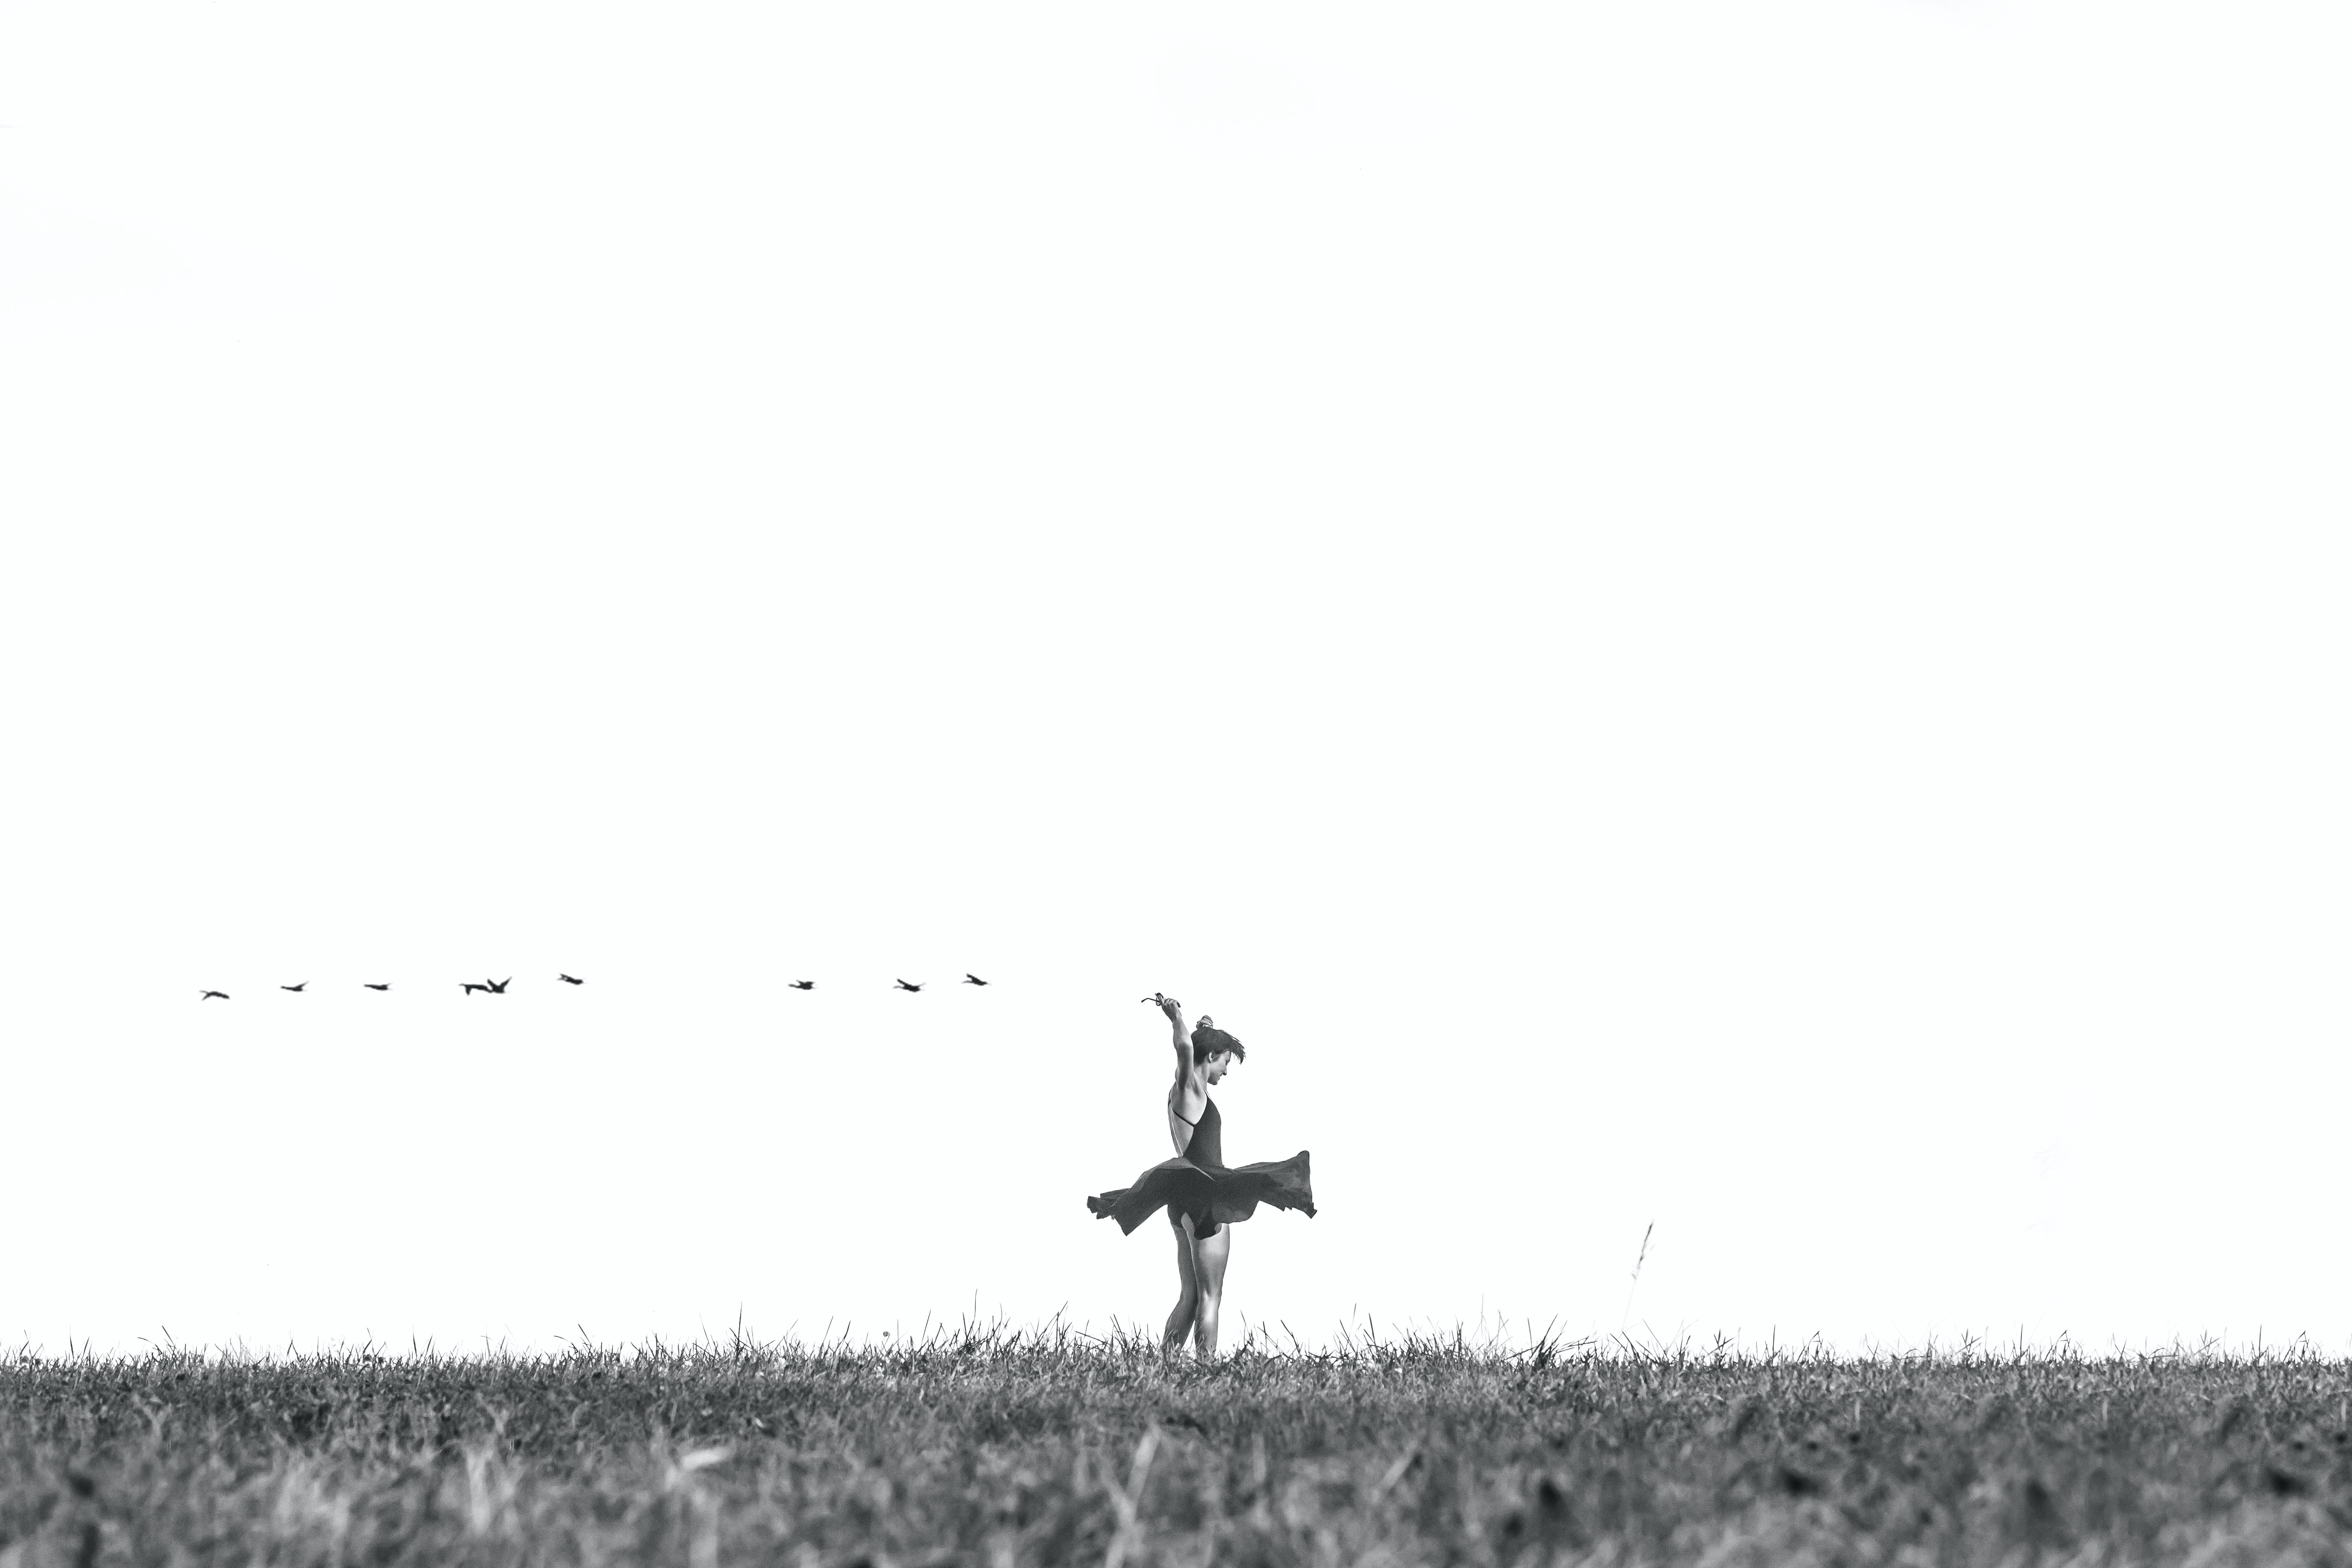 matthew-henry-NioJfLM4OVo-unsplash